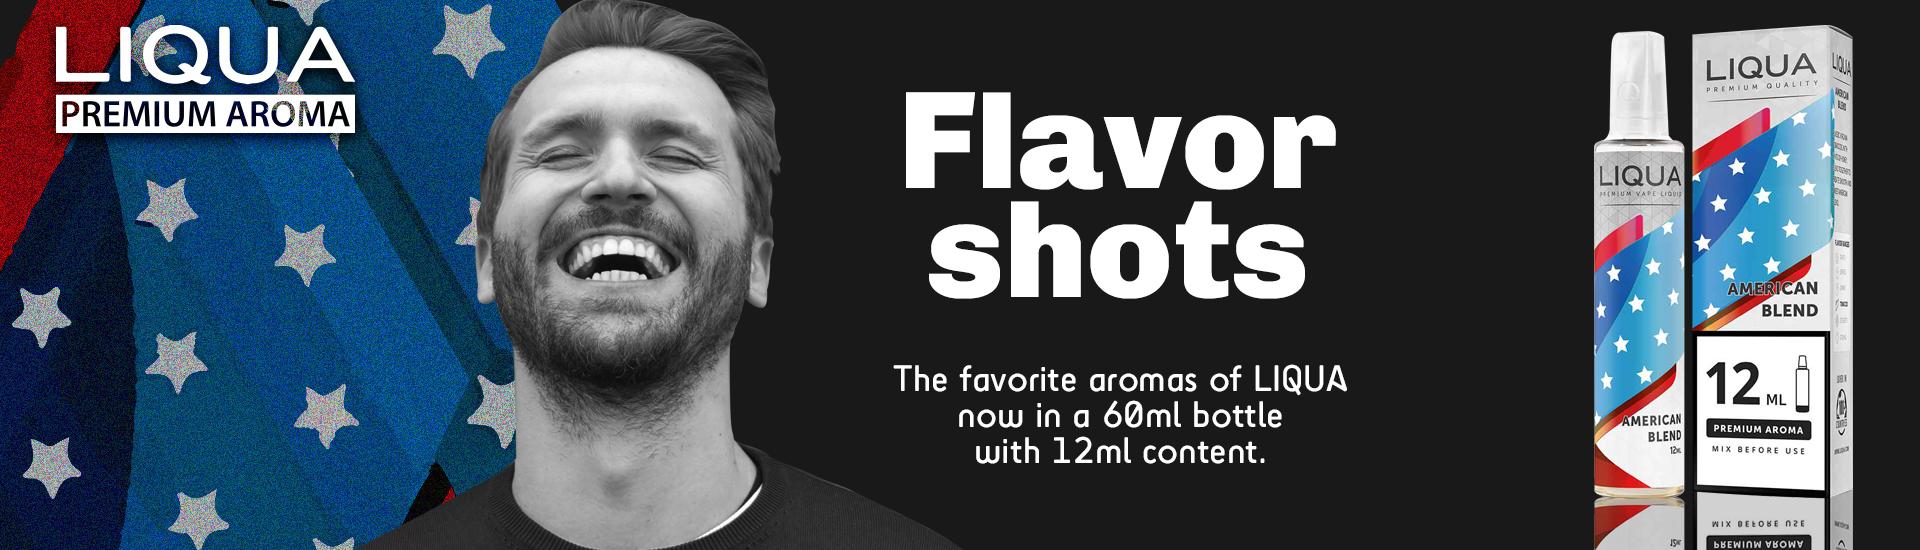 Liqua American Blend 12ml/60ml Flavorshot